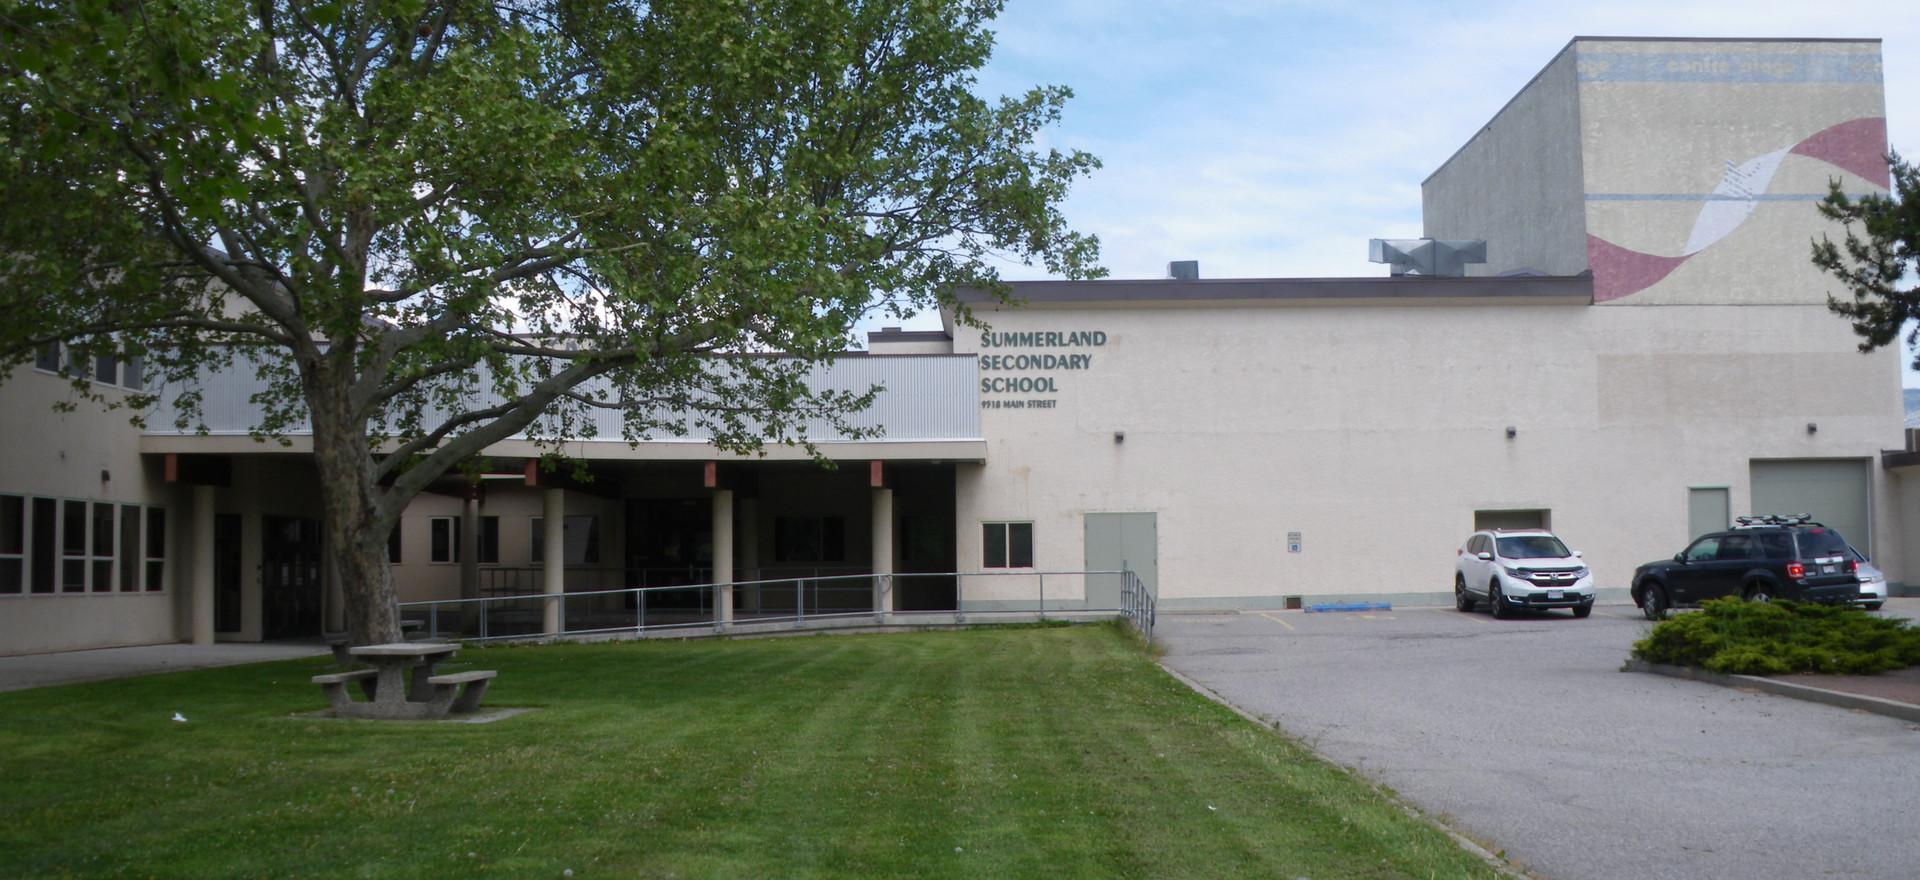 Summerland Seconday School